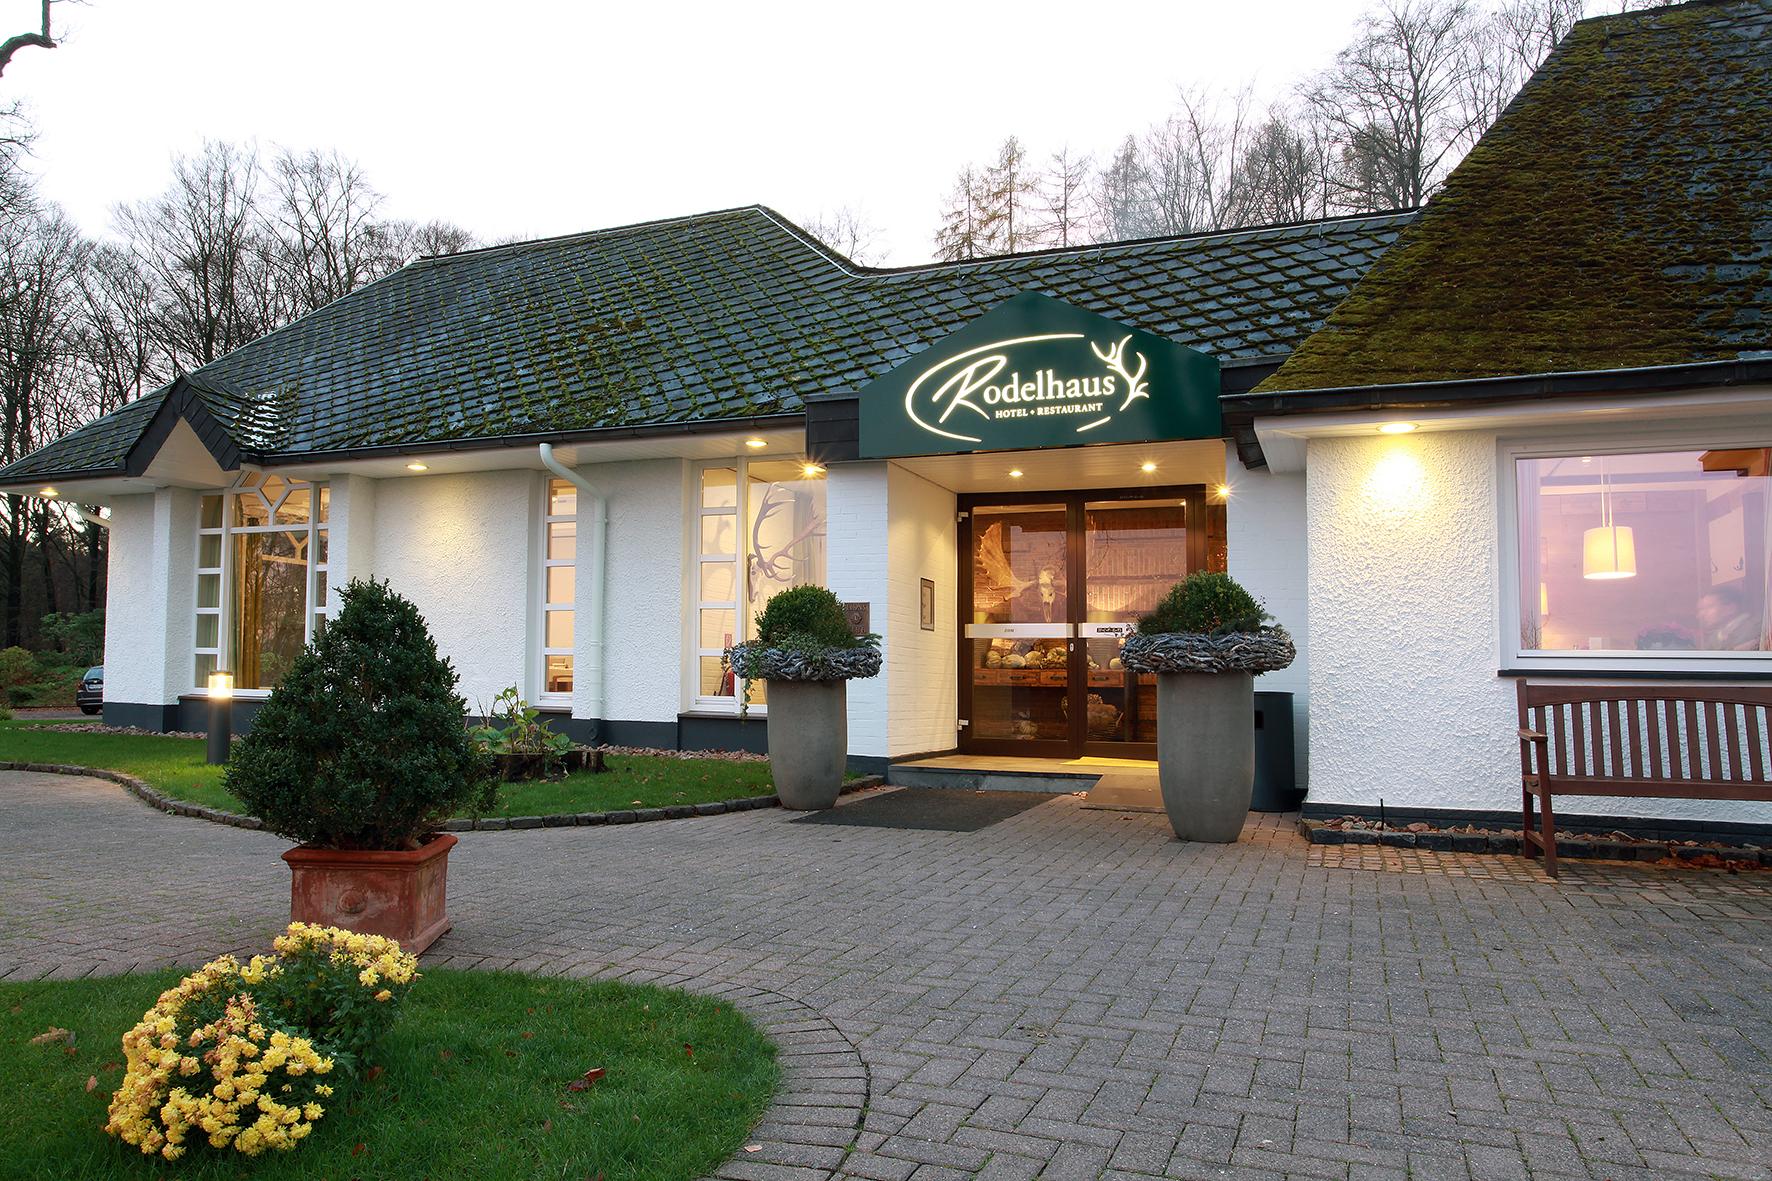 Restaurant Rodelhaus